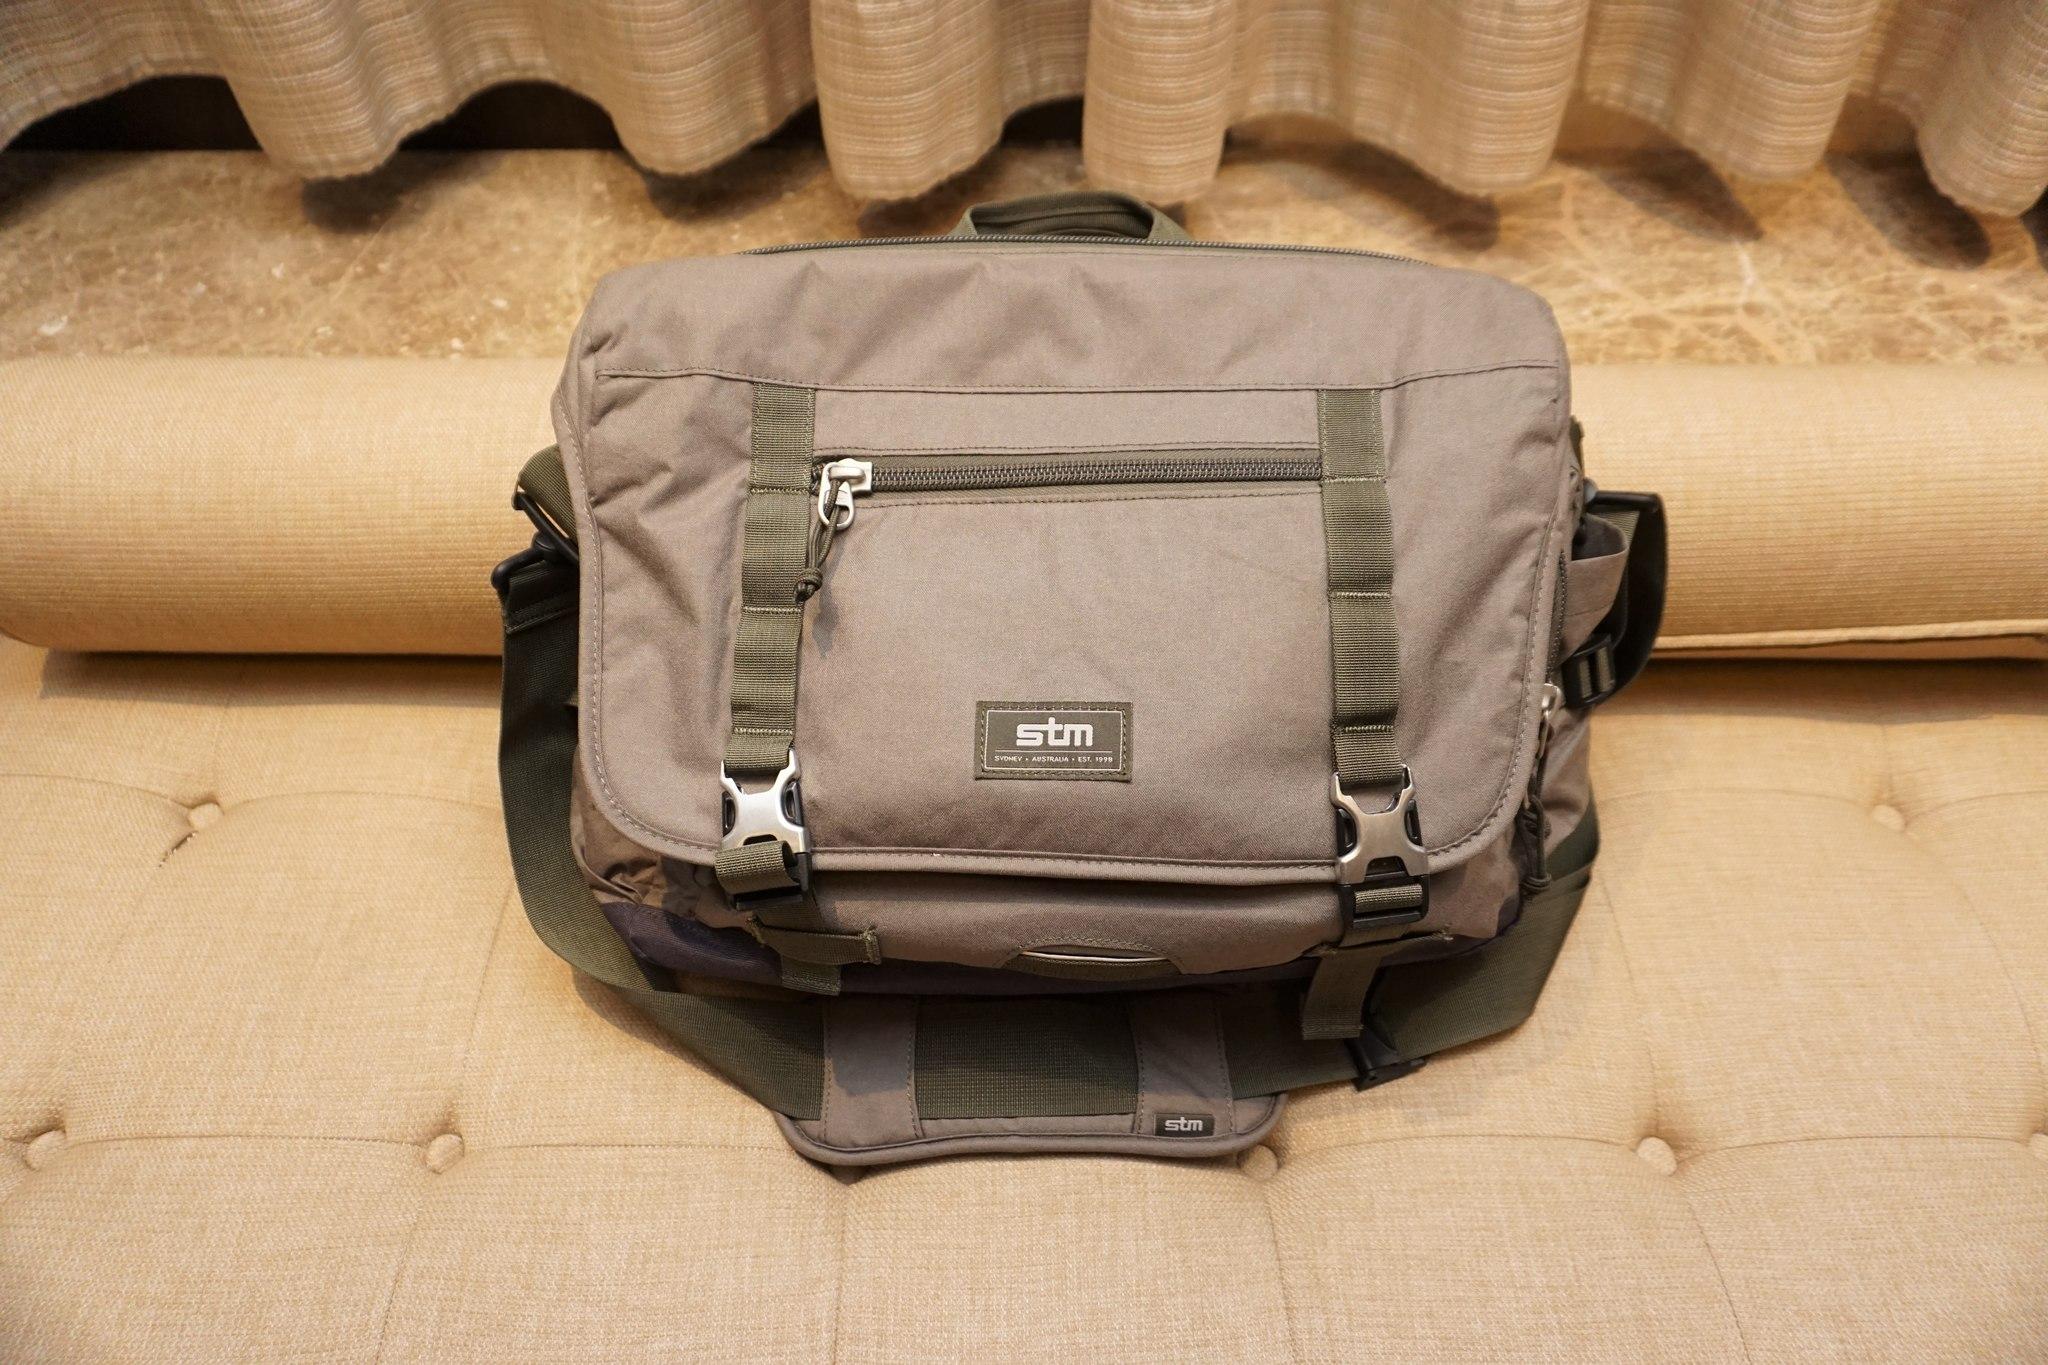 stm-trust-15-inch-laptop-messenger-bag-main